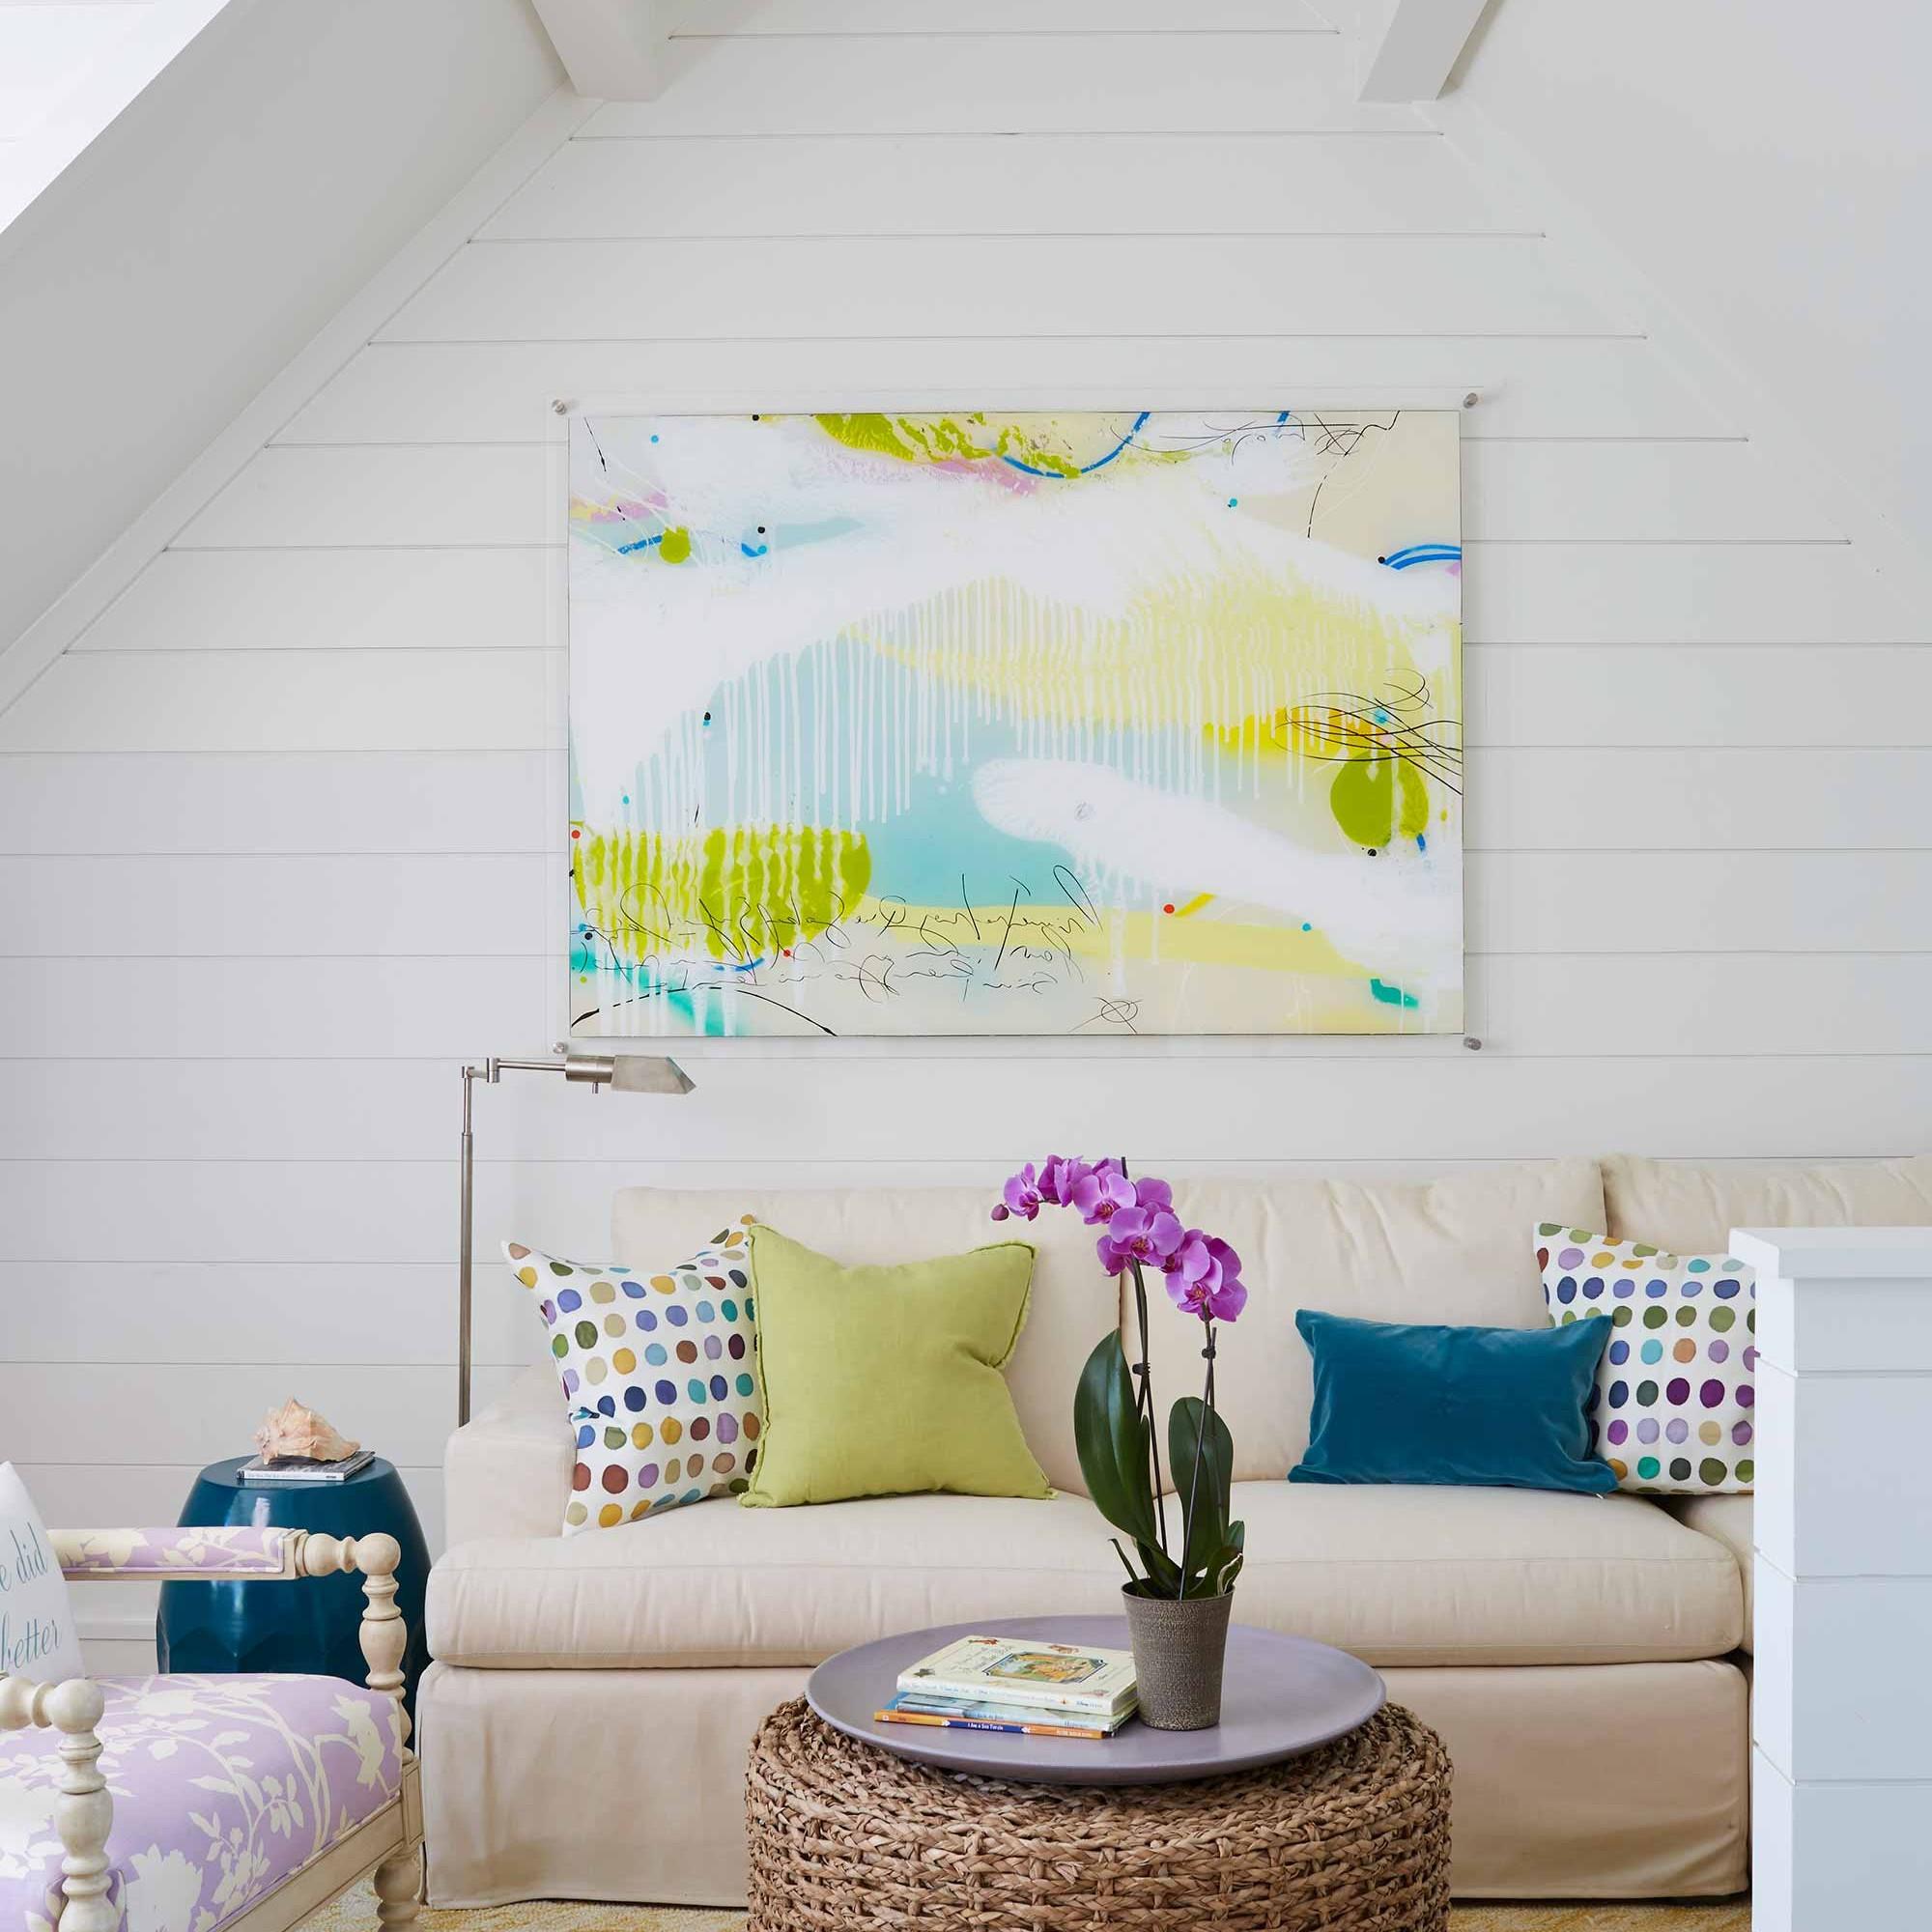 Coastal kids room interior design by Darci Hether in New York